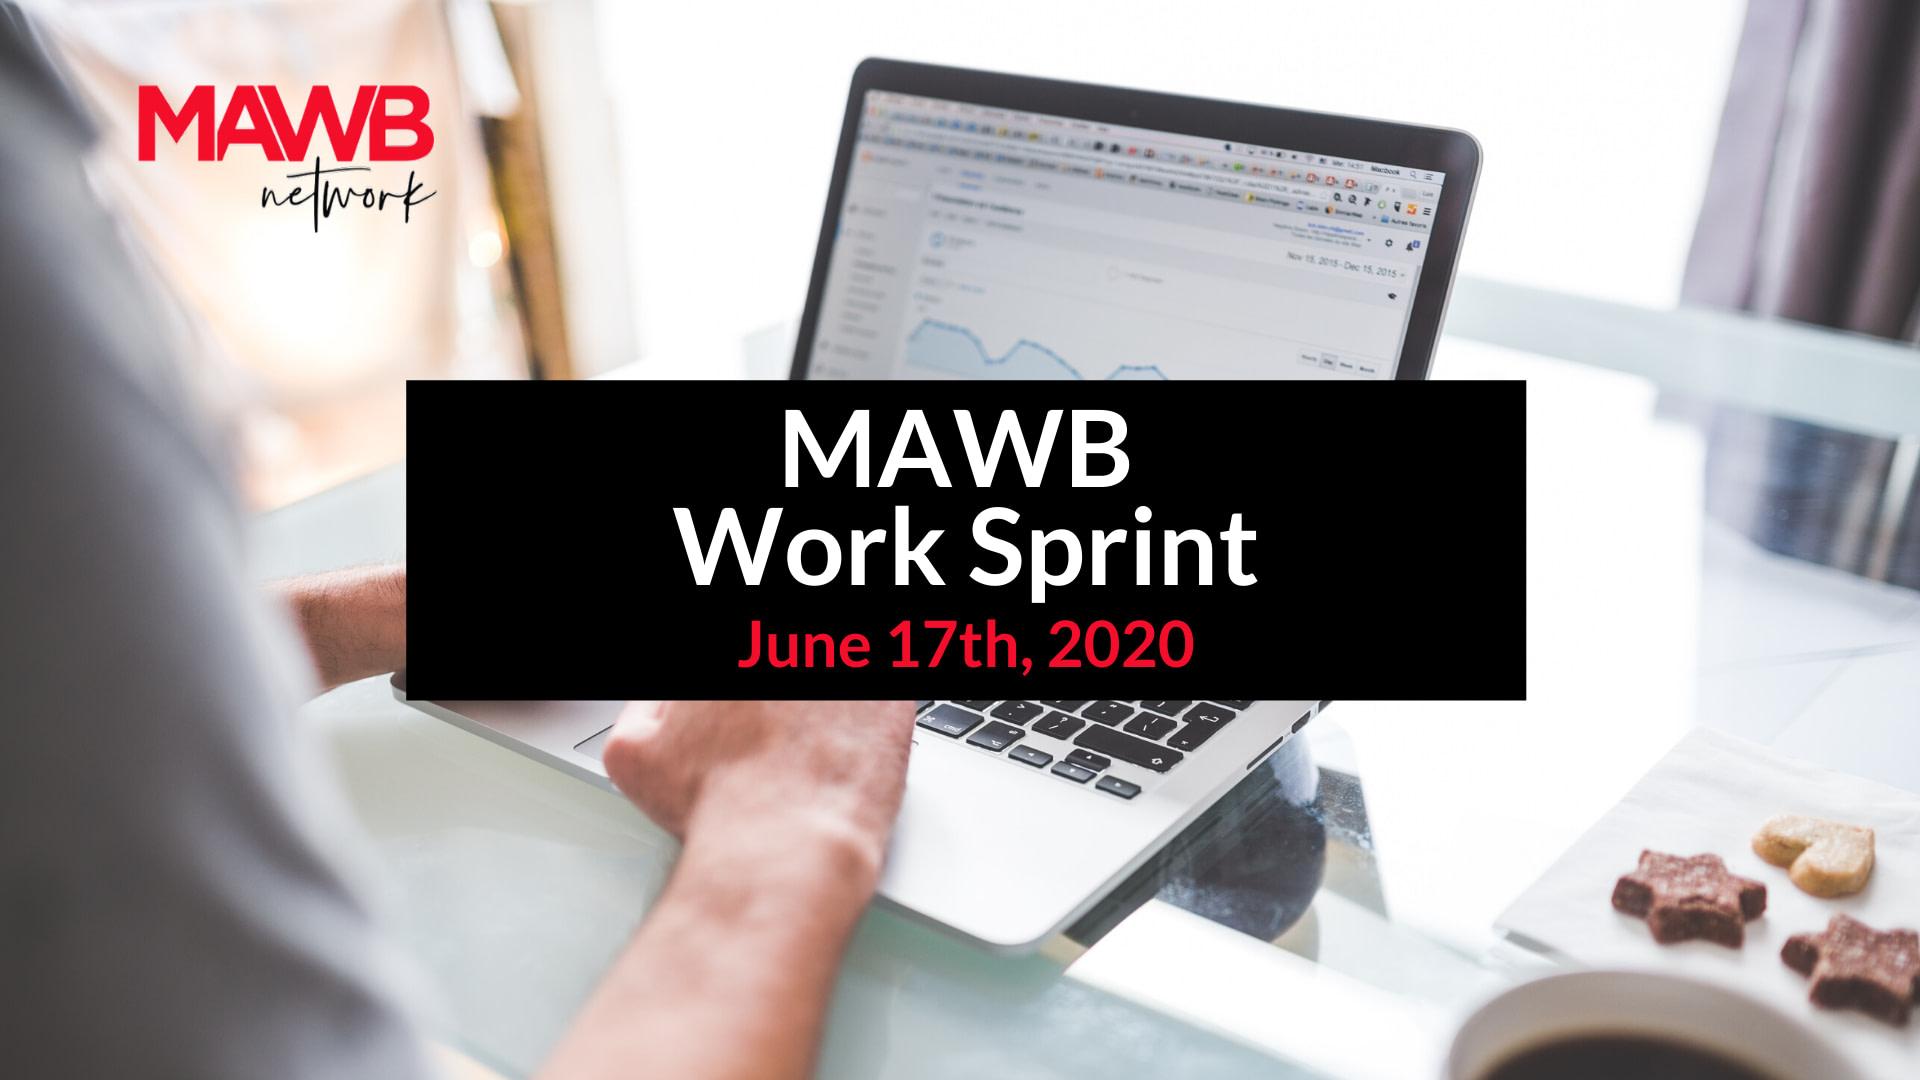 MAWB Work Spring - June 17th